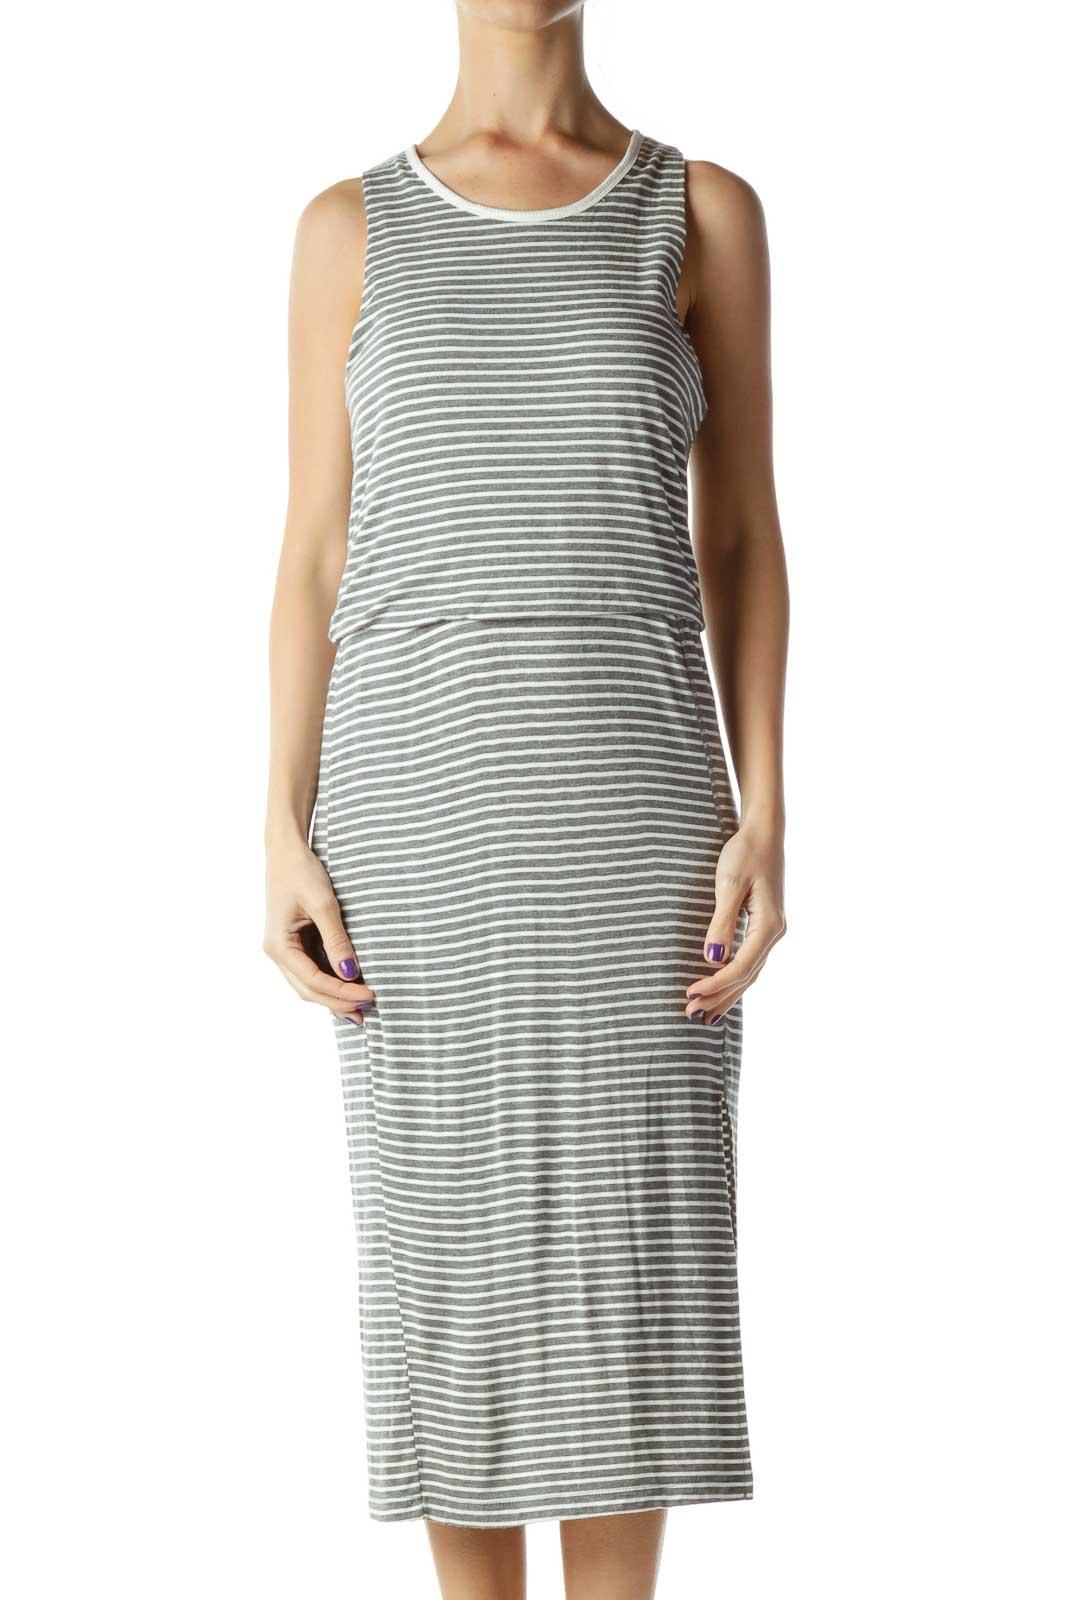 Gray Cream Stripe Jersey Dress Front